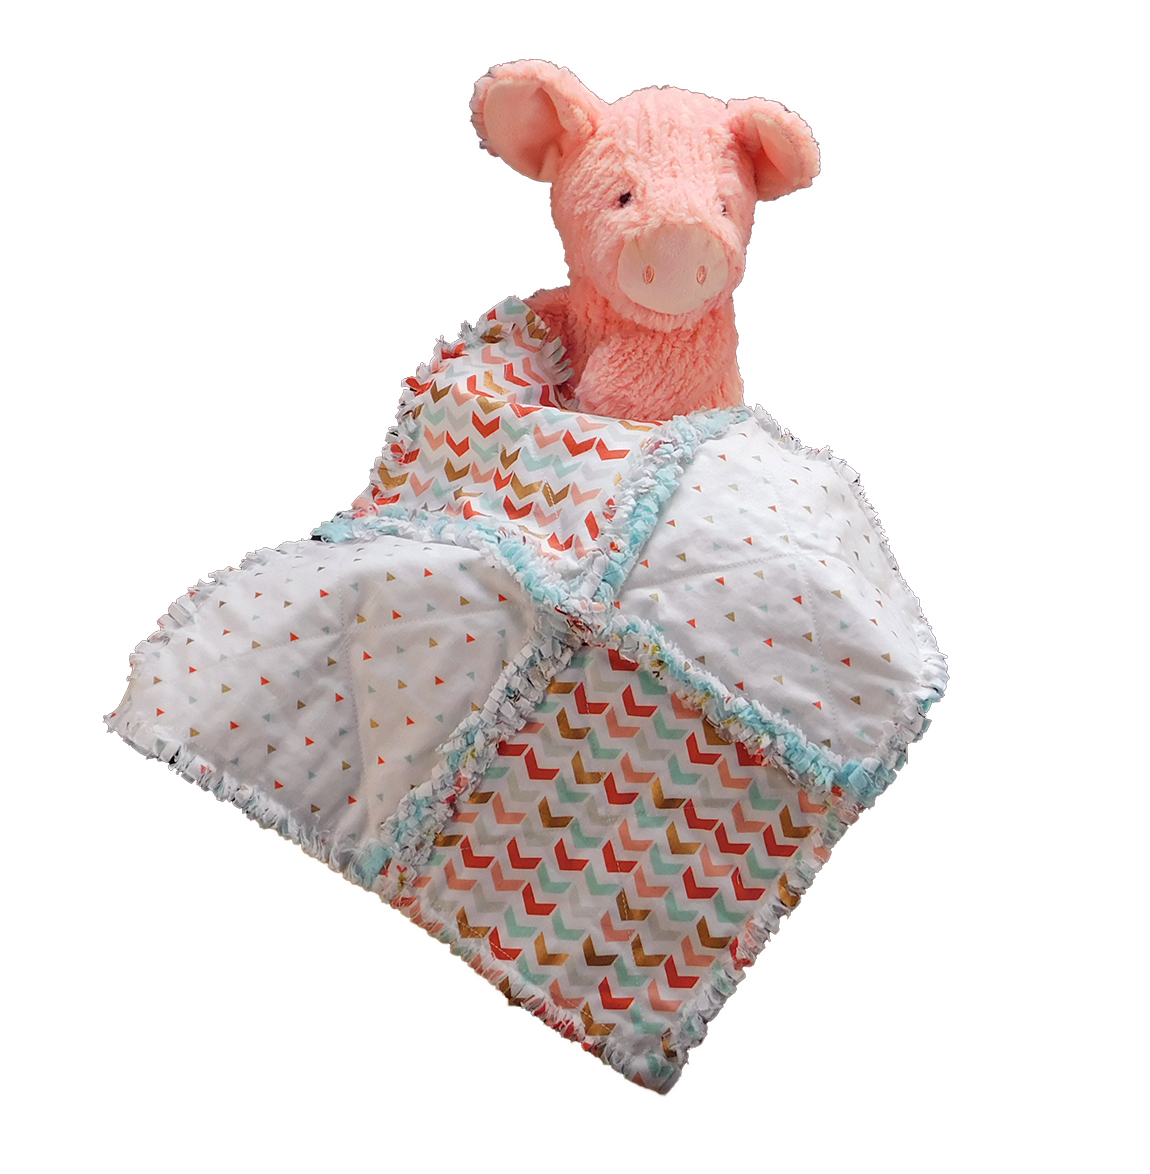 piglet-security-blanket